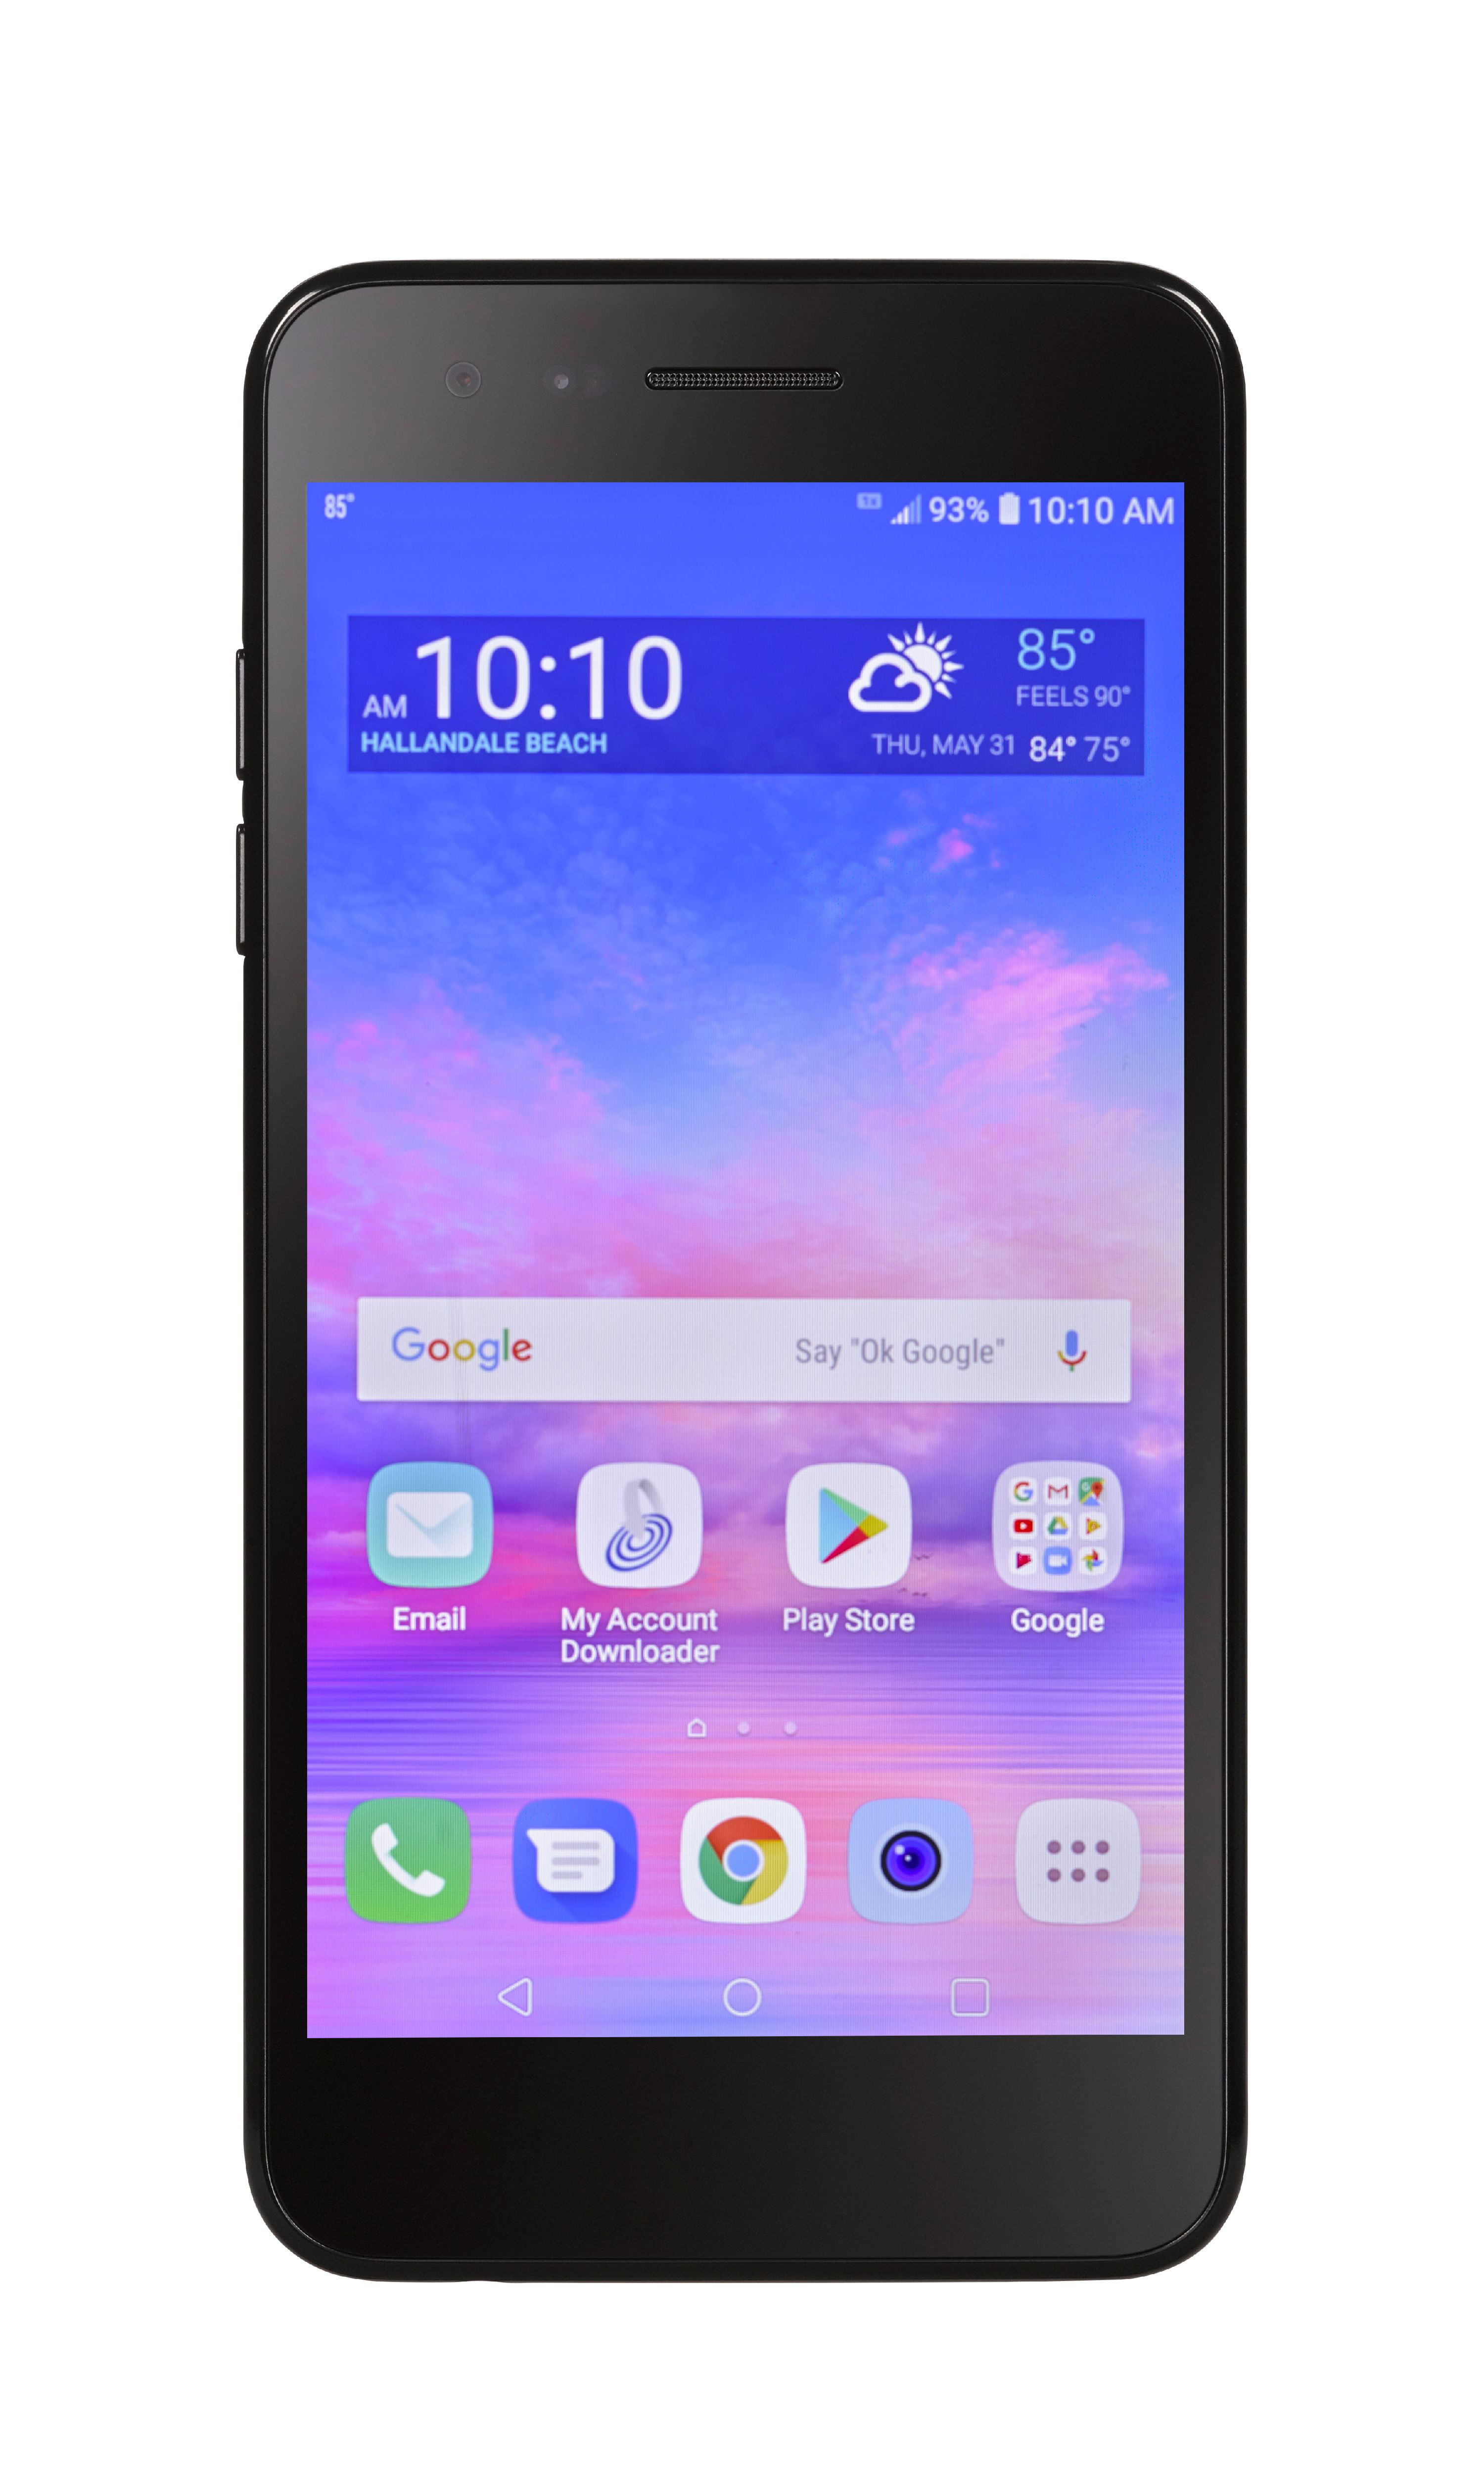 Tracfone Wireless LG Rebel 4 Prepaid Smartphone